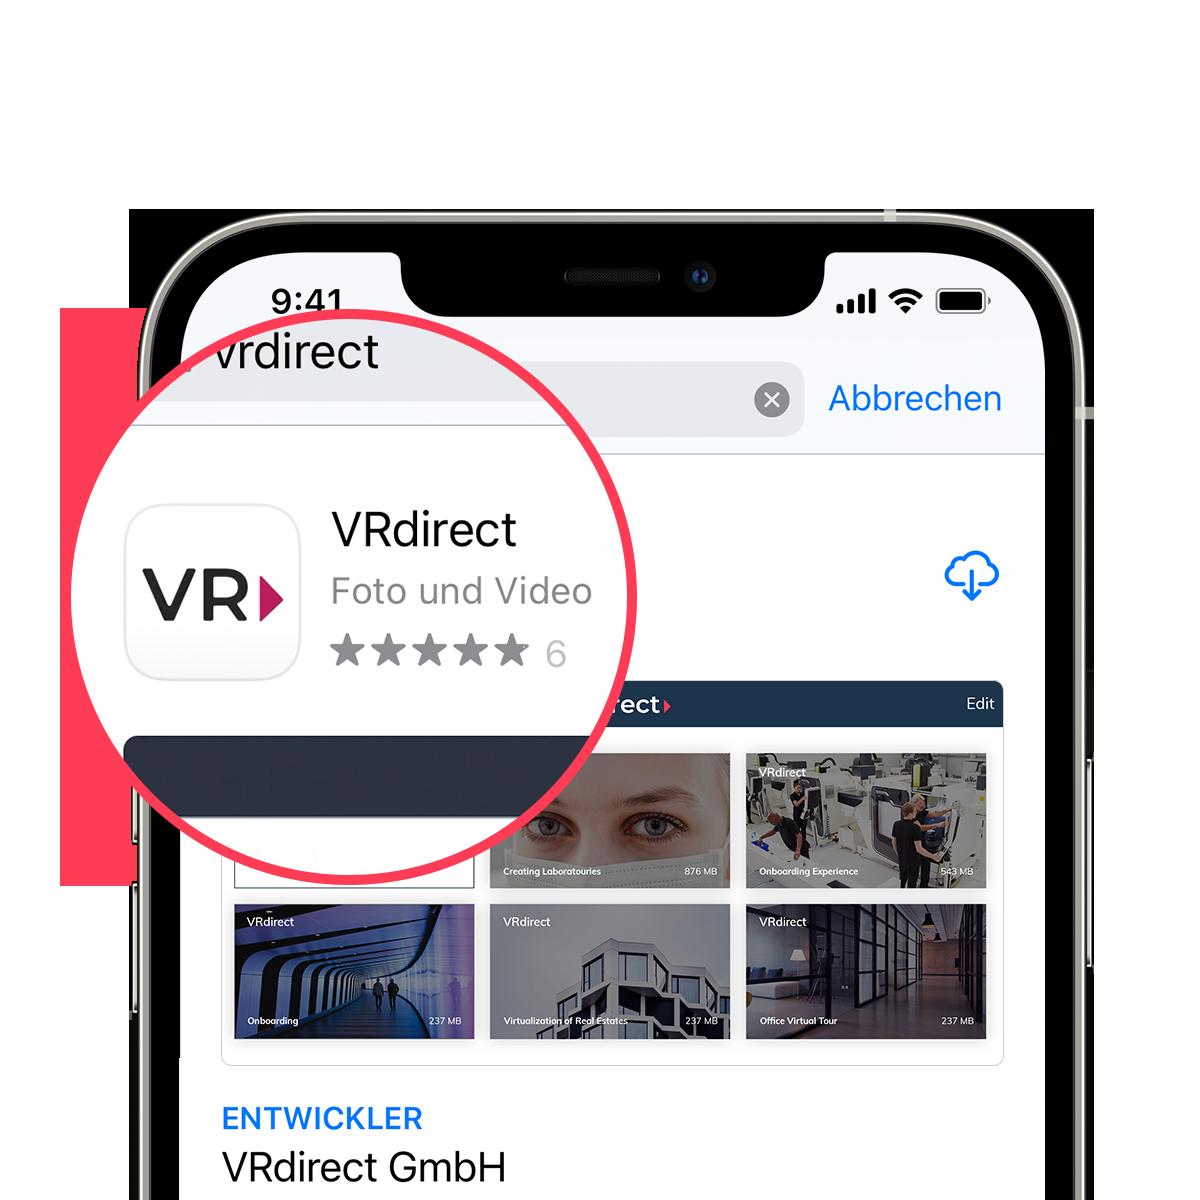 VRdirect App Unlimited Access